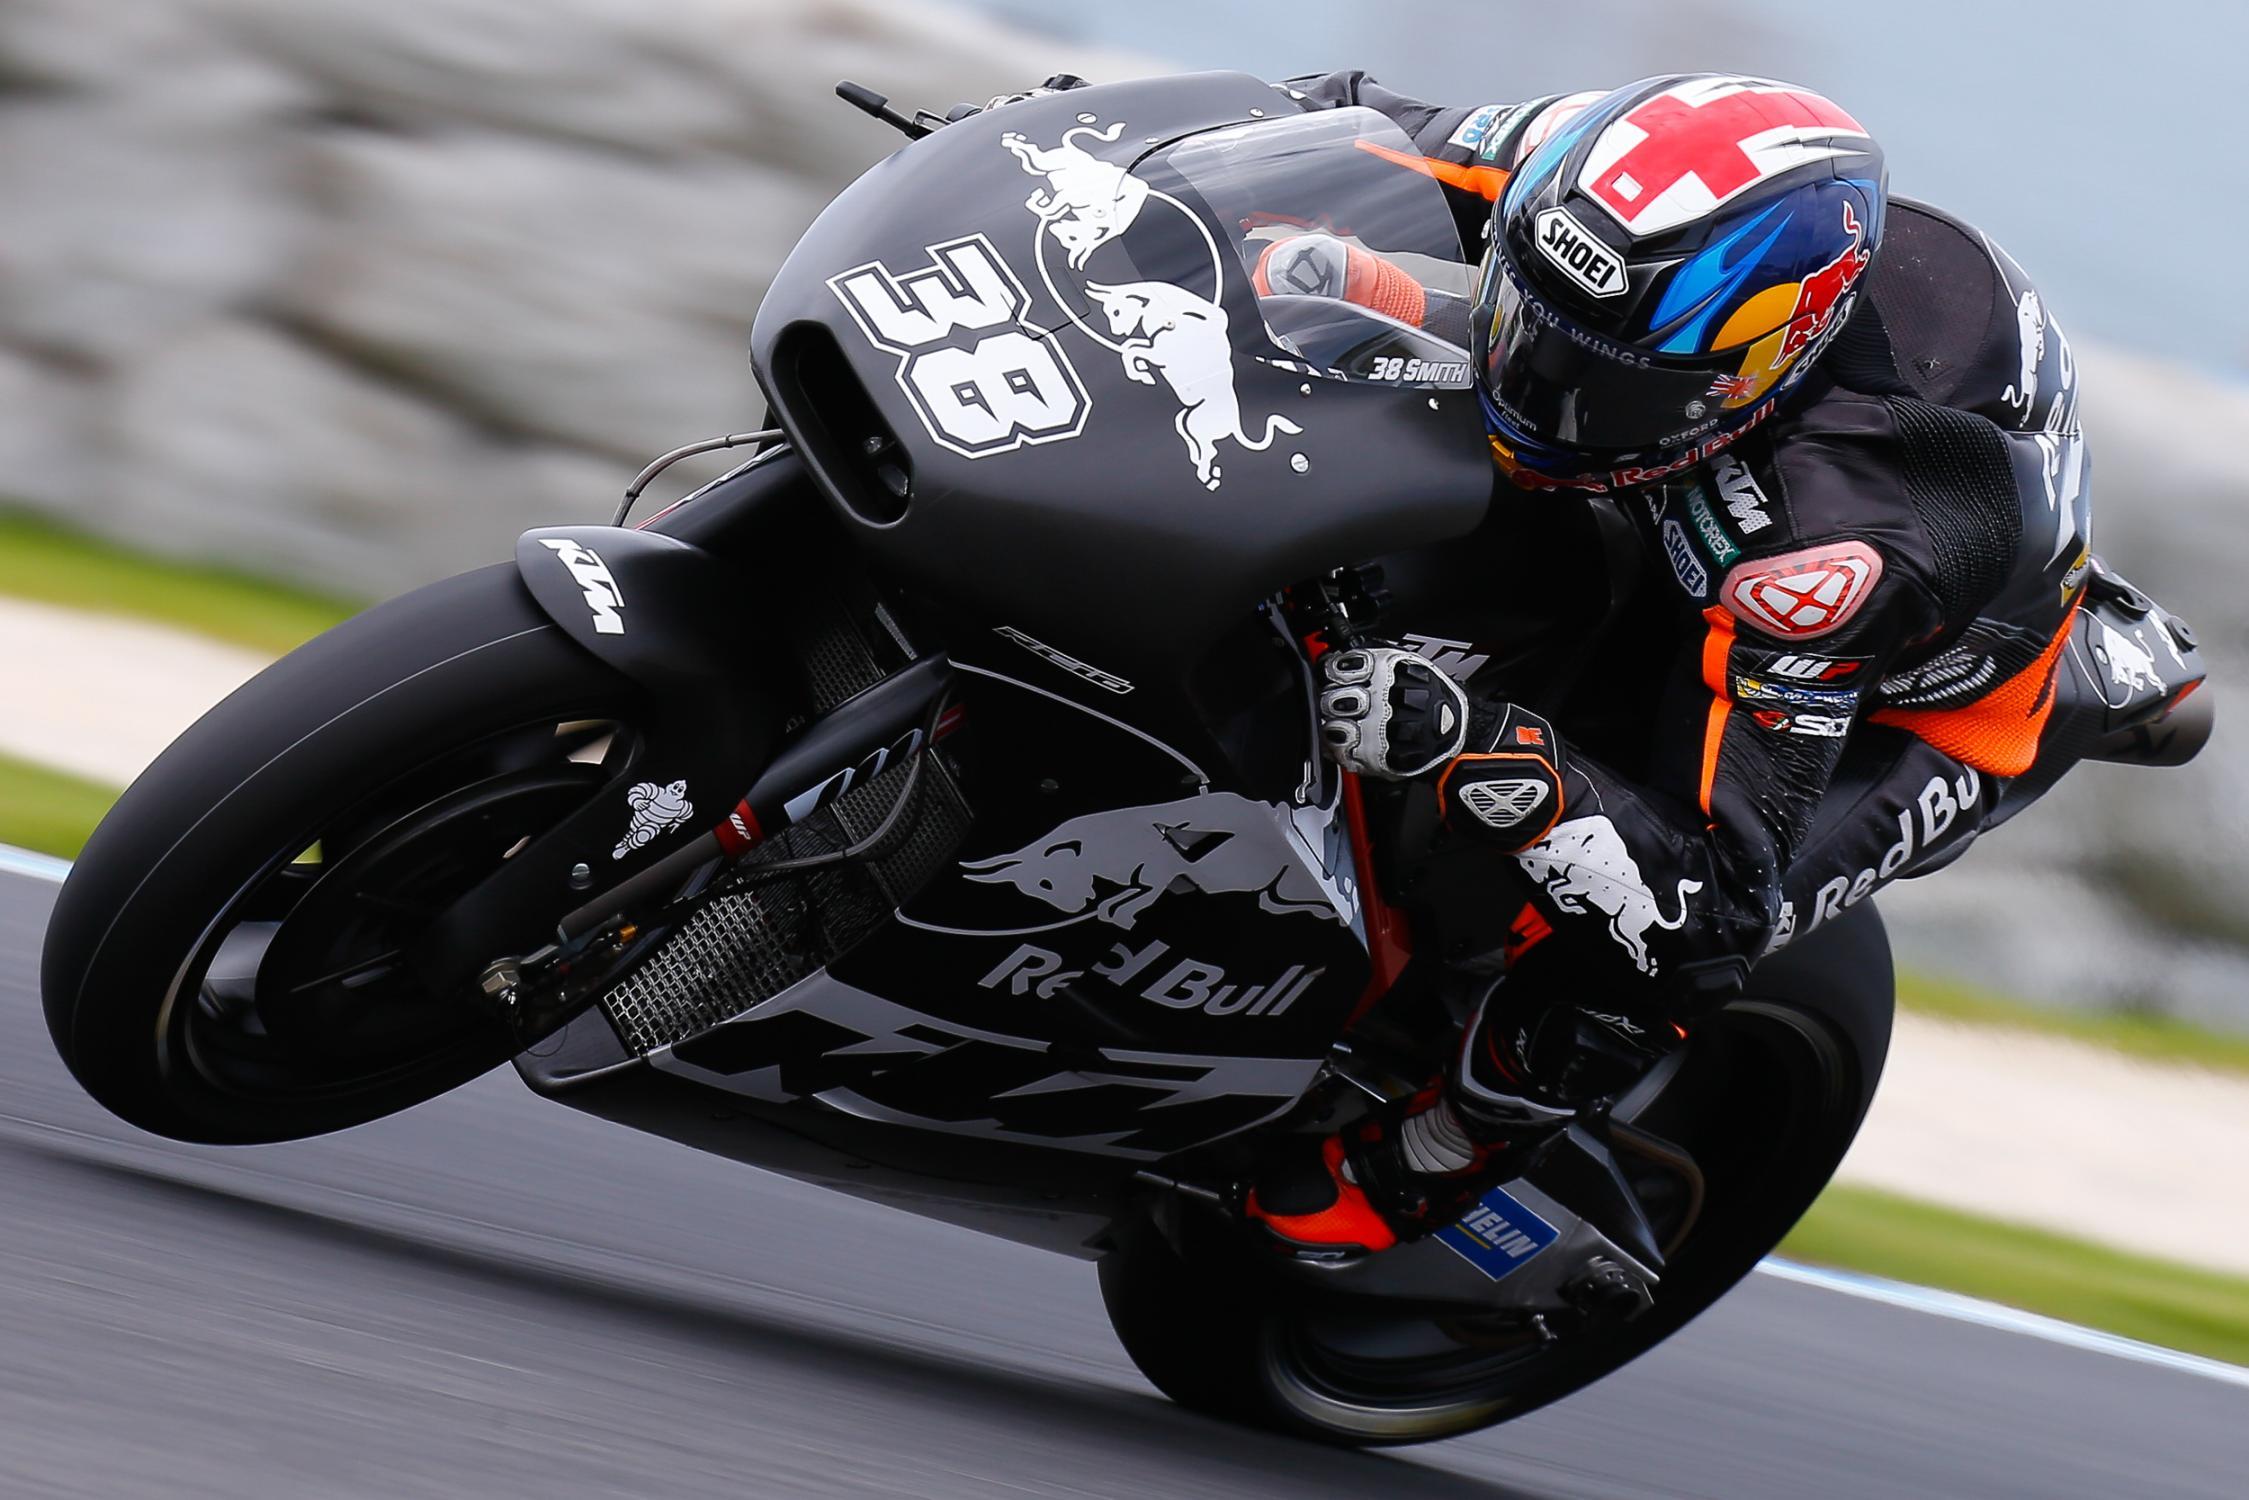 [MotoGP] Test Phillip Island 38-bradley-smith-eng-2017-action-australia-motogp-phillip-island-pre-season-test15168_test2017_action.gallery_full_top_fullscreen